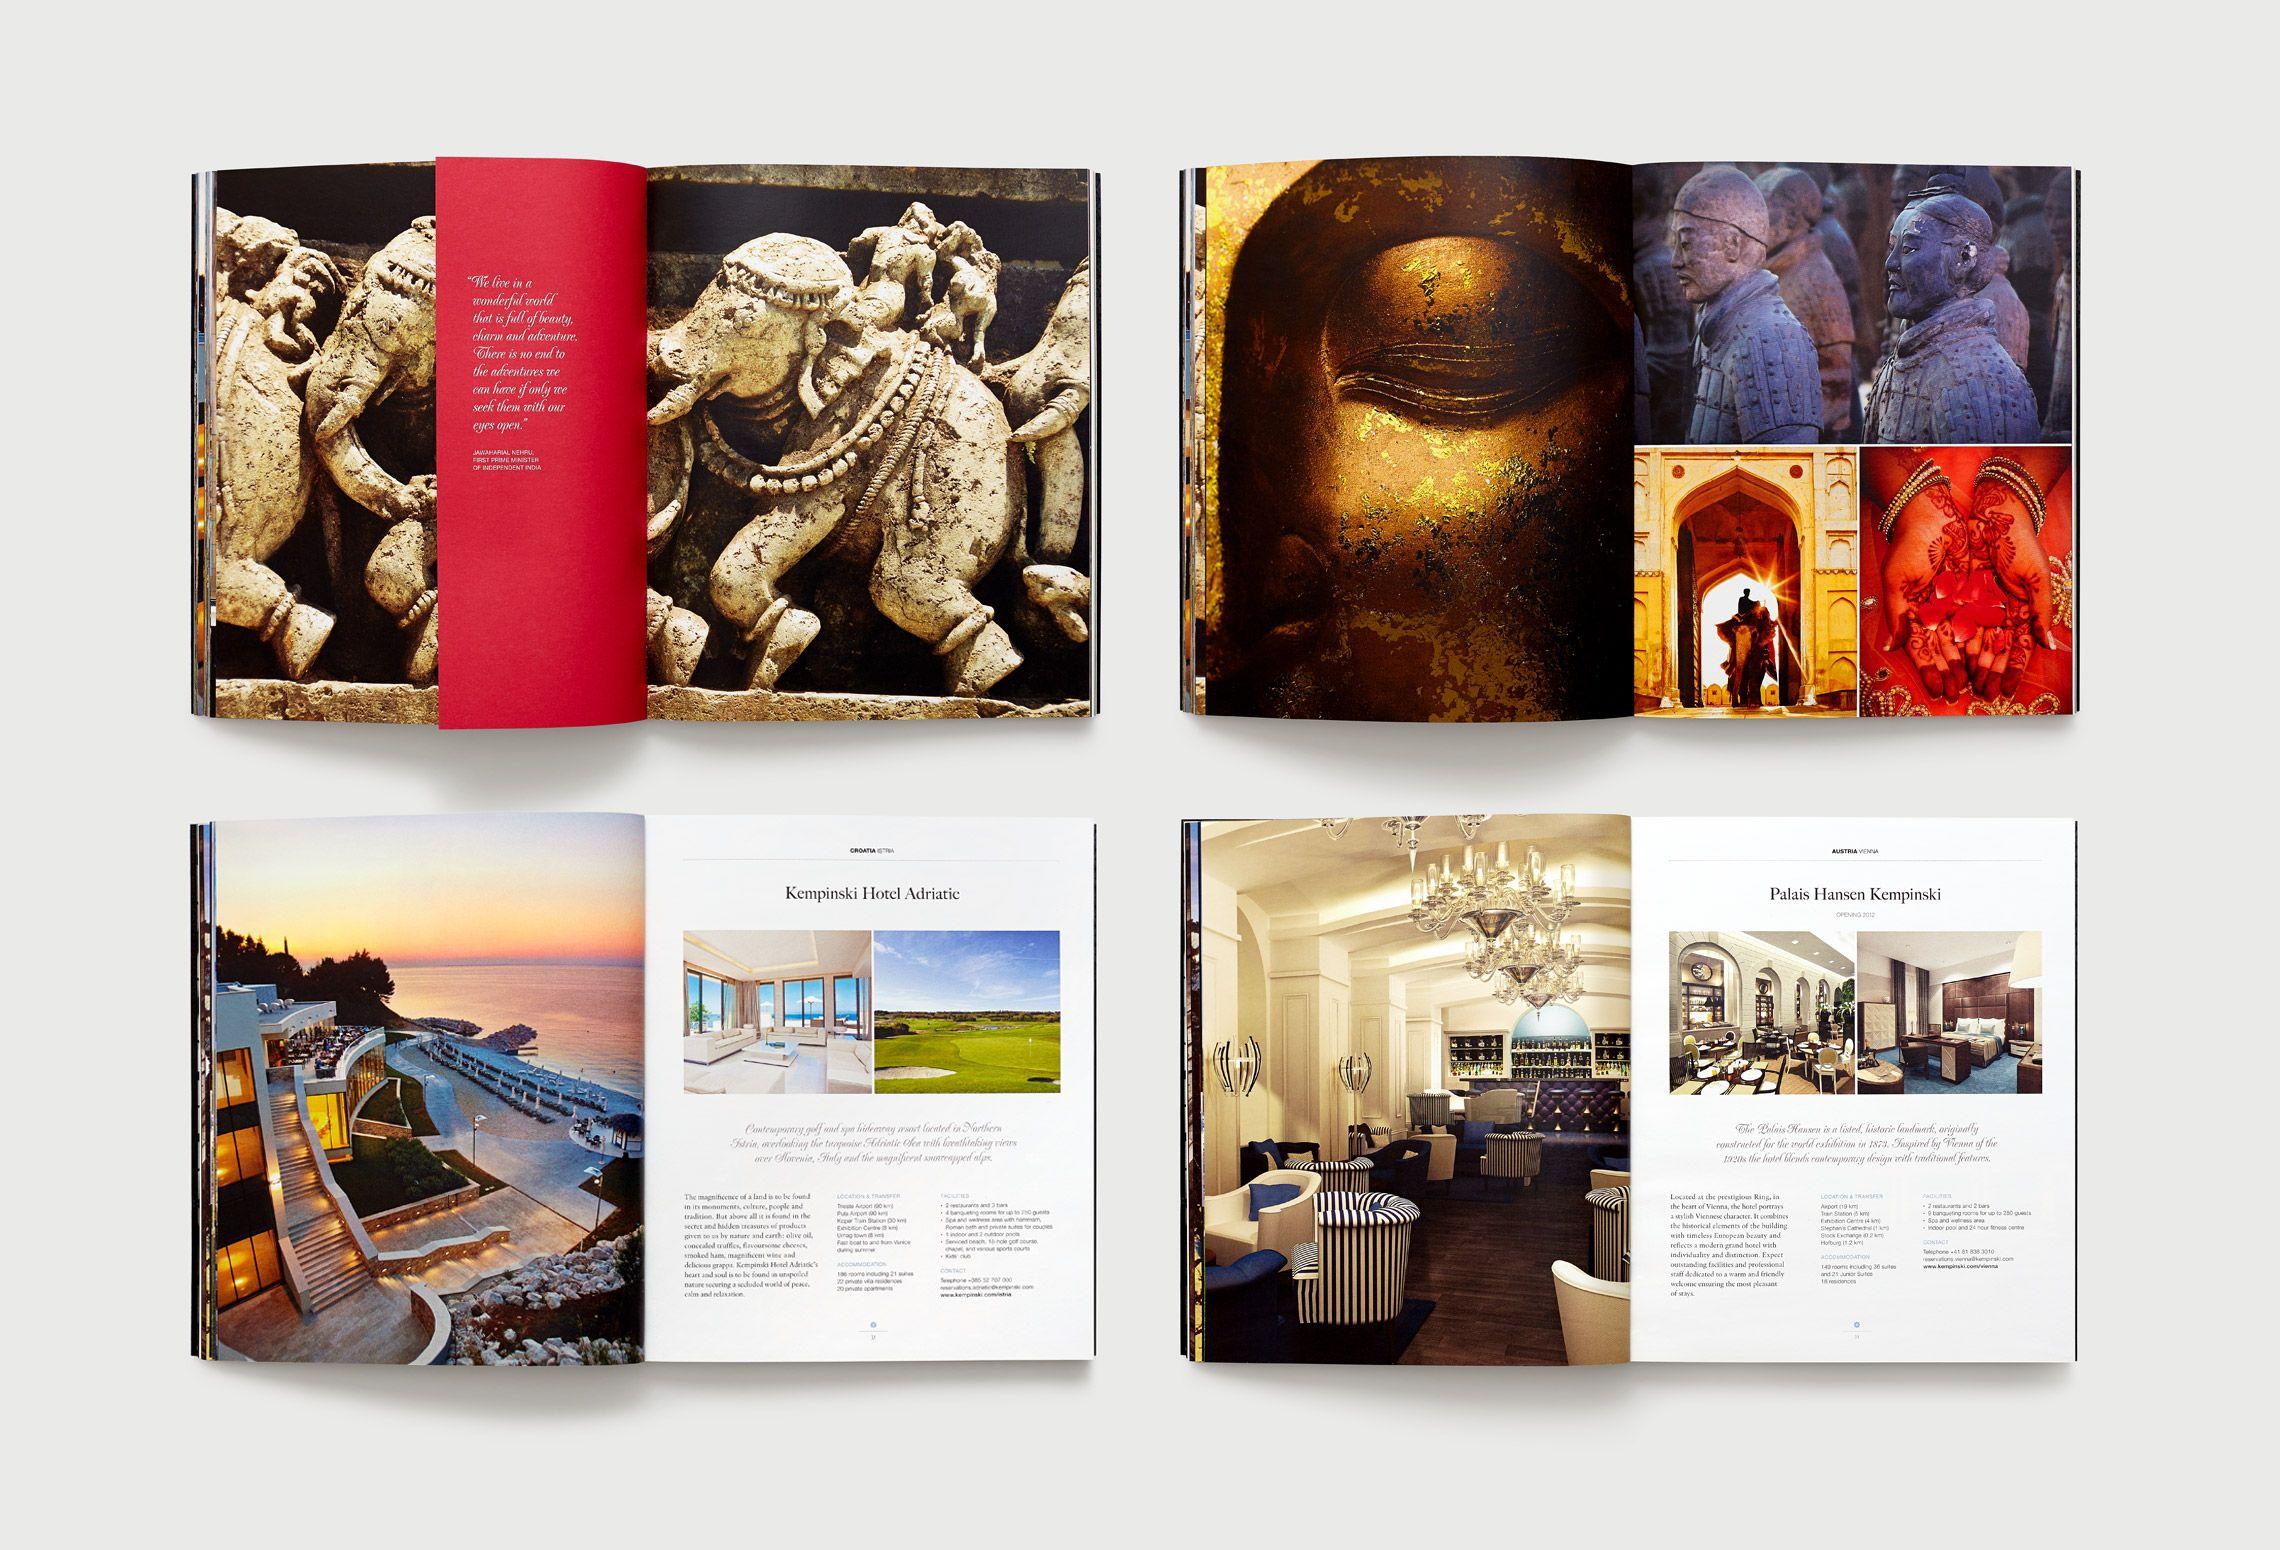 Inaria  Luxury Brand Design Consultants  Kempinski Hotels Brand